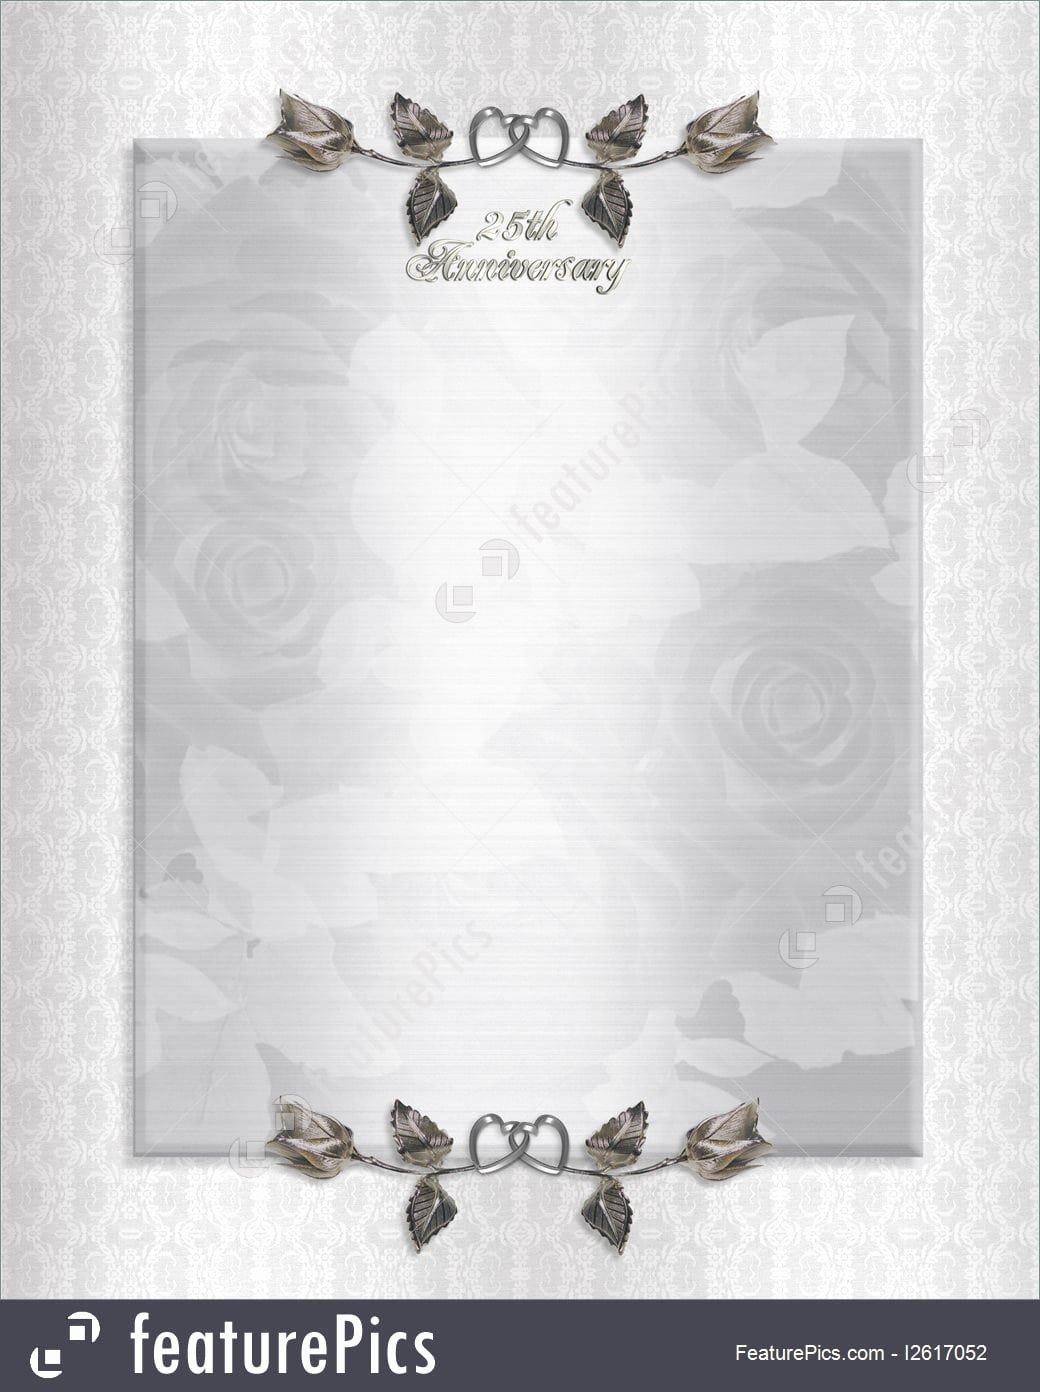 25th Wedding Anniversary Invitations Templates Fresh Silver Wedding Anniversary Invitations Templates